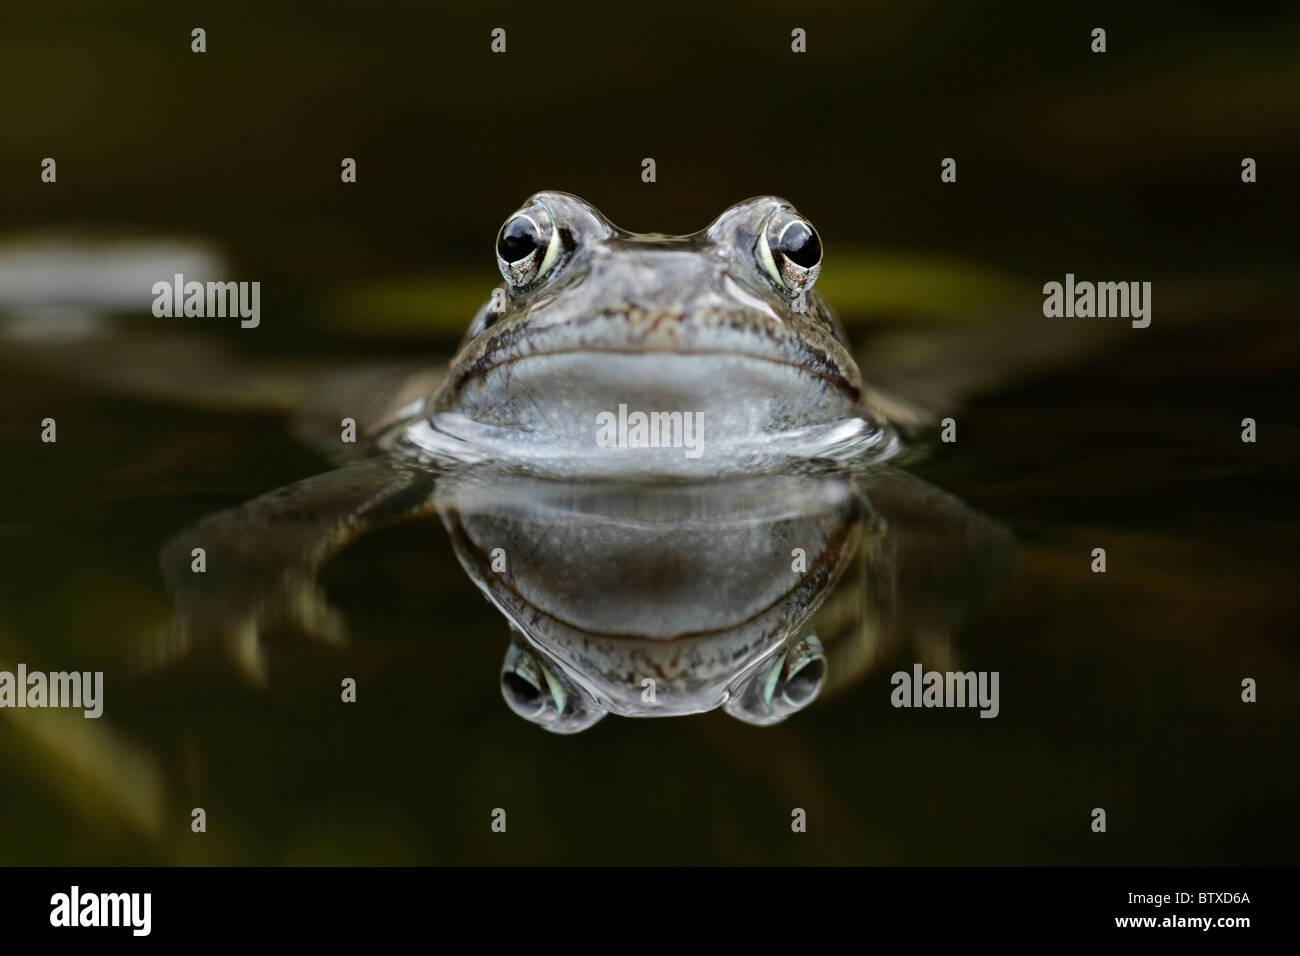 Common Frog (Rana temporaria), in garden pond, Germany - Stock Image